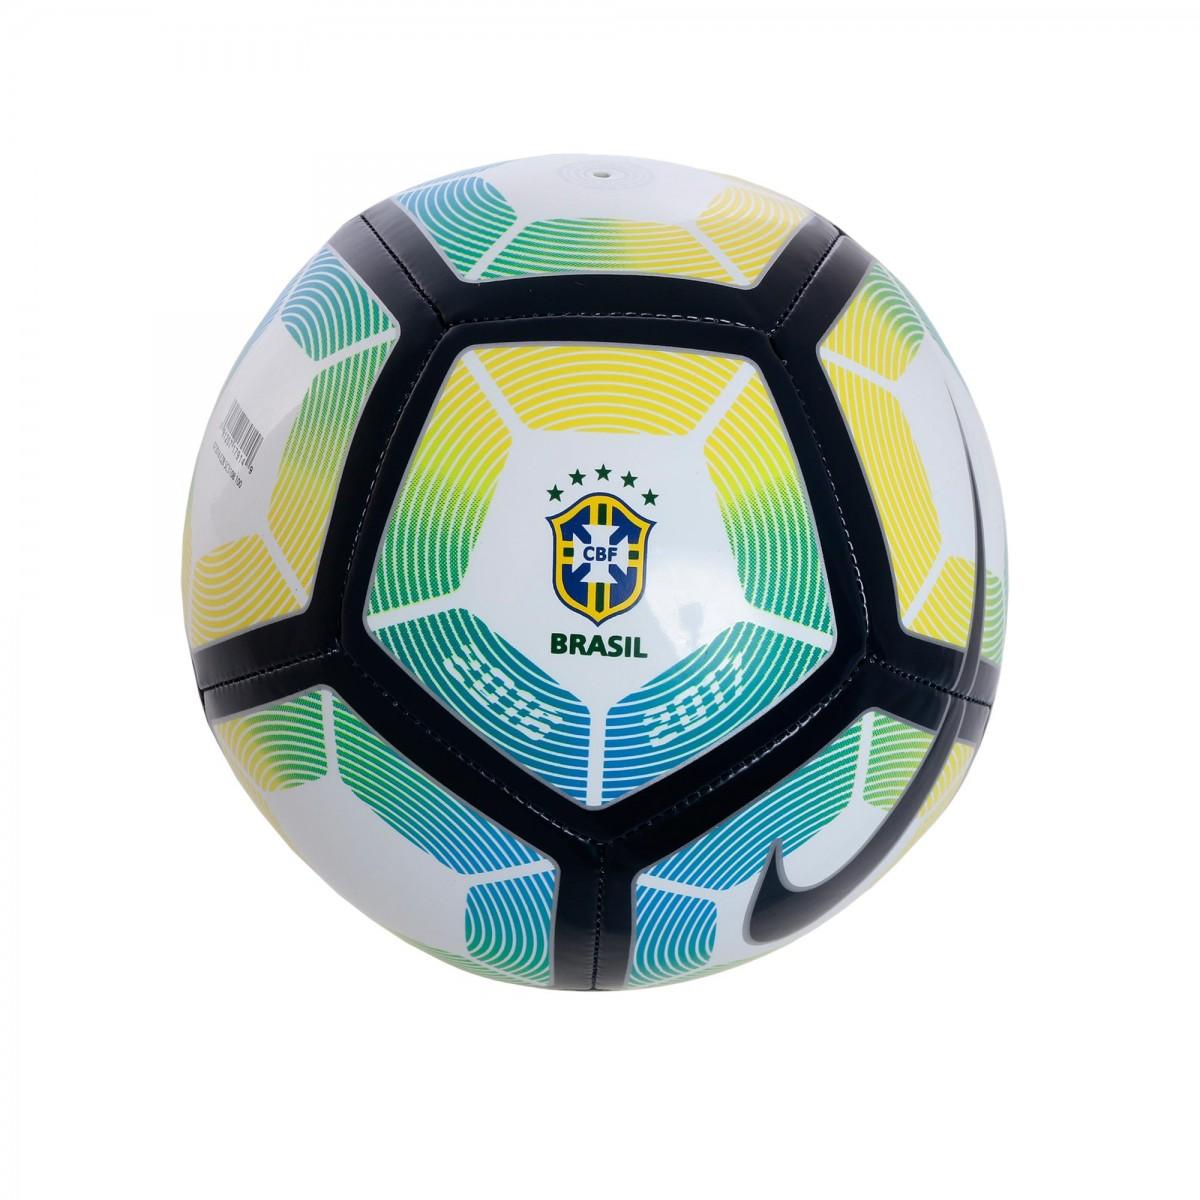 Bizz Store - Mini Bola Futebol De Campo Nike Skills CBF 0eeedd7ff761f